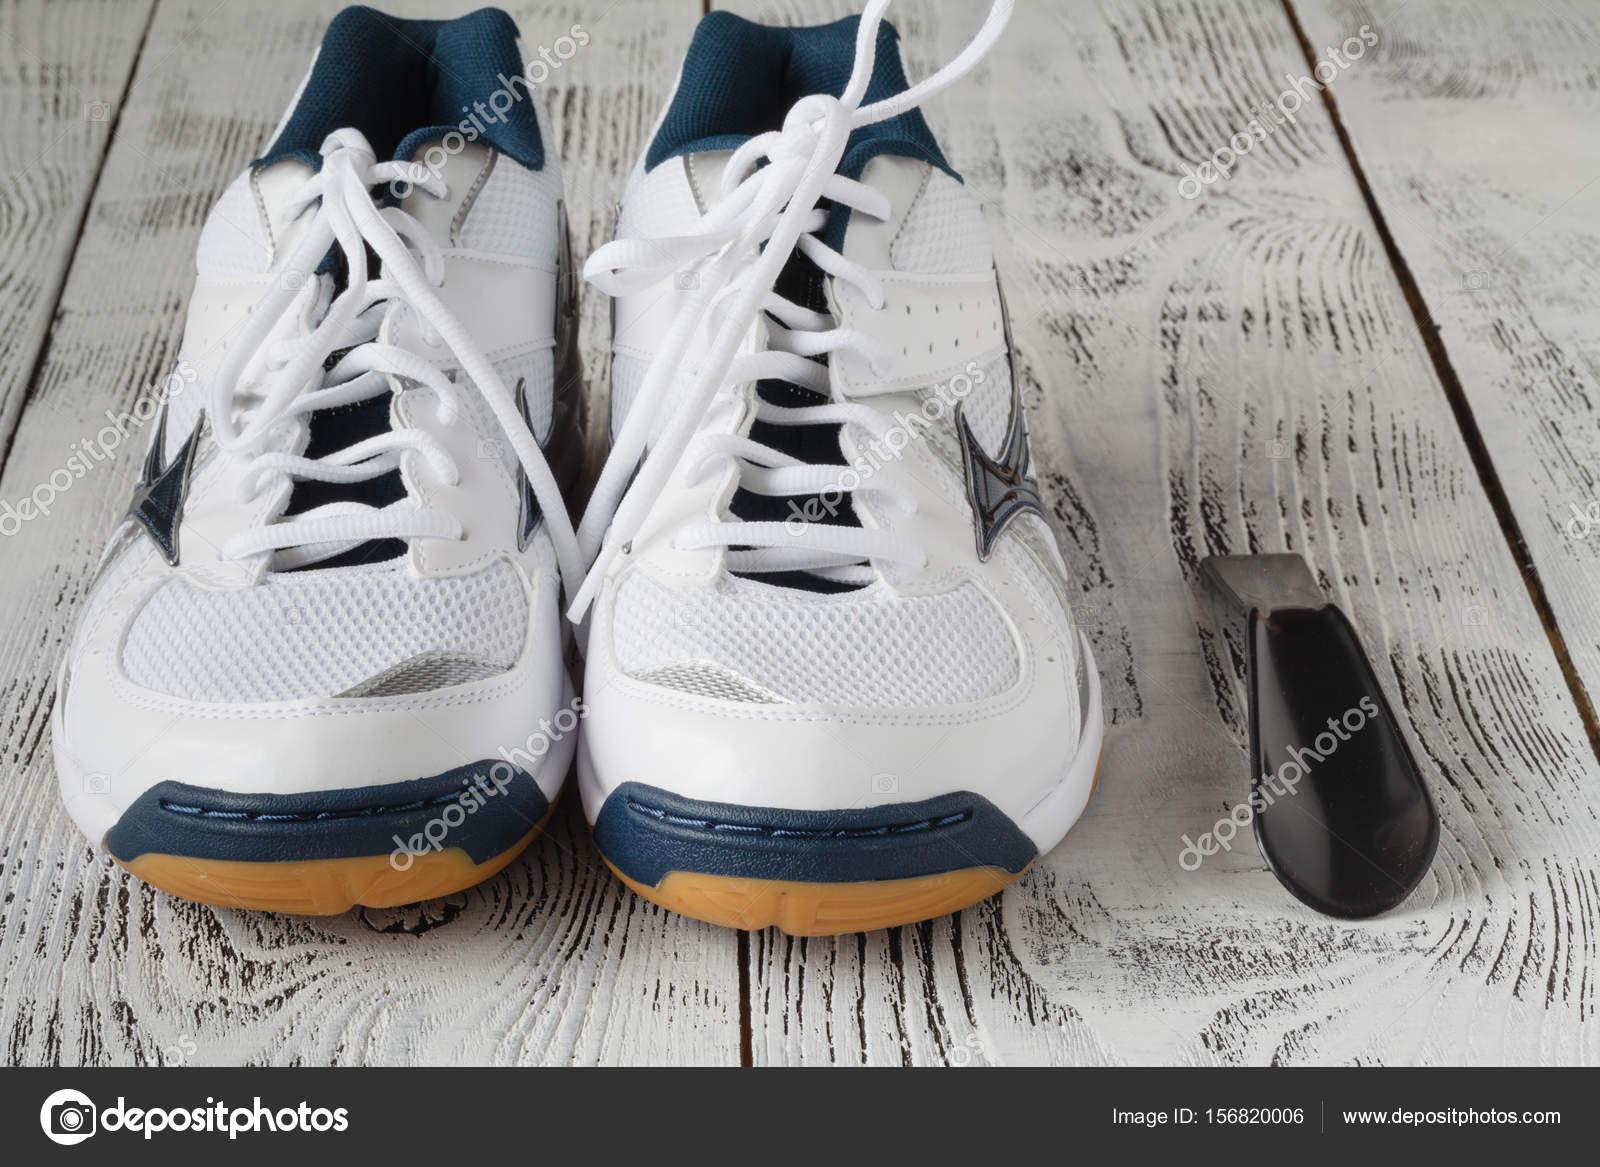 b5db2d442e3 Αθλητισμός, γυμναστήριο, παπούτσια, υποδήματα και αντικείμενα έννοια ...